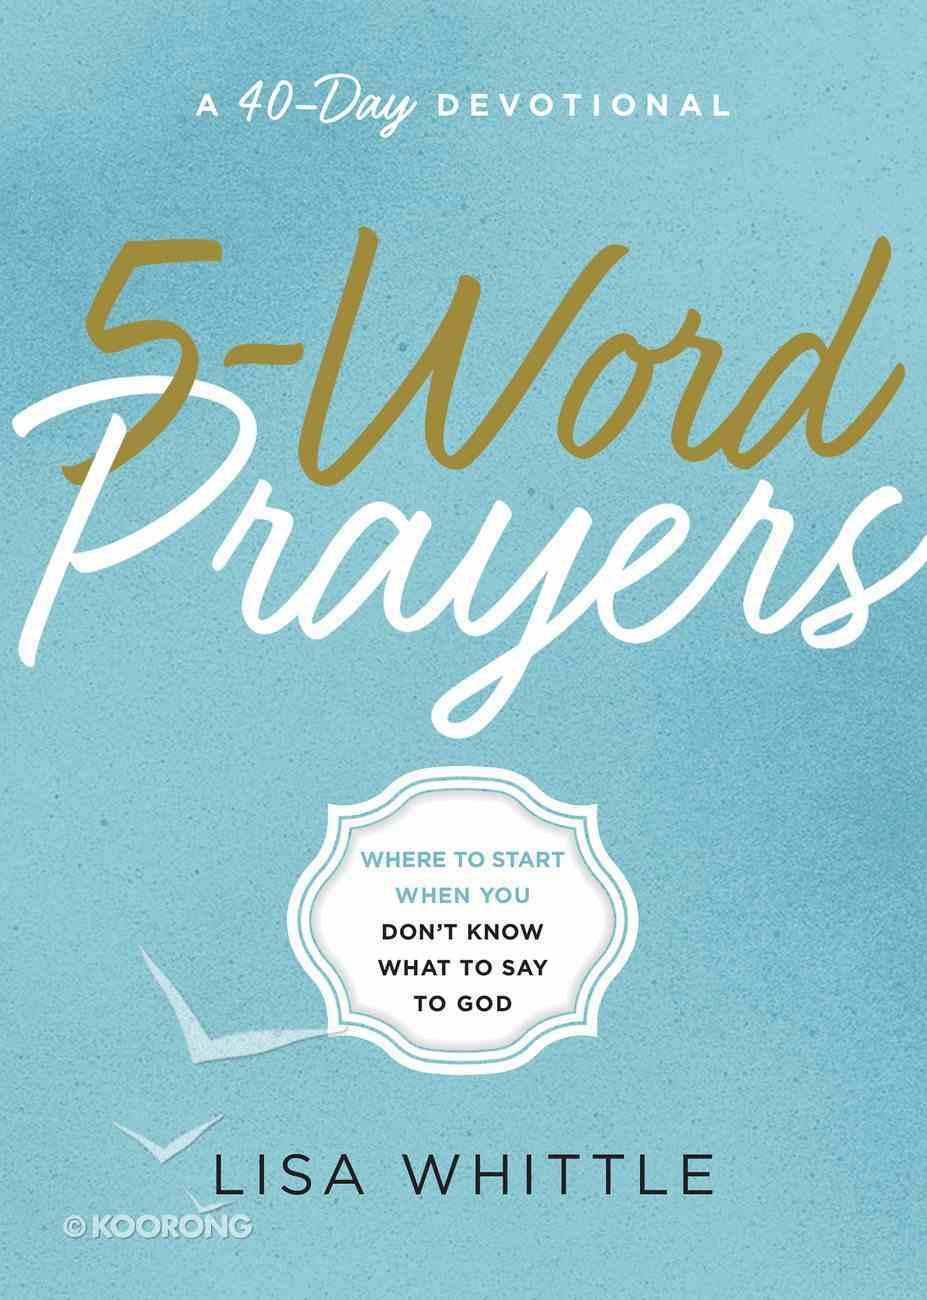 5-Word Prayers eBook